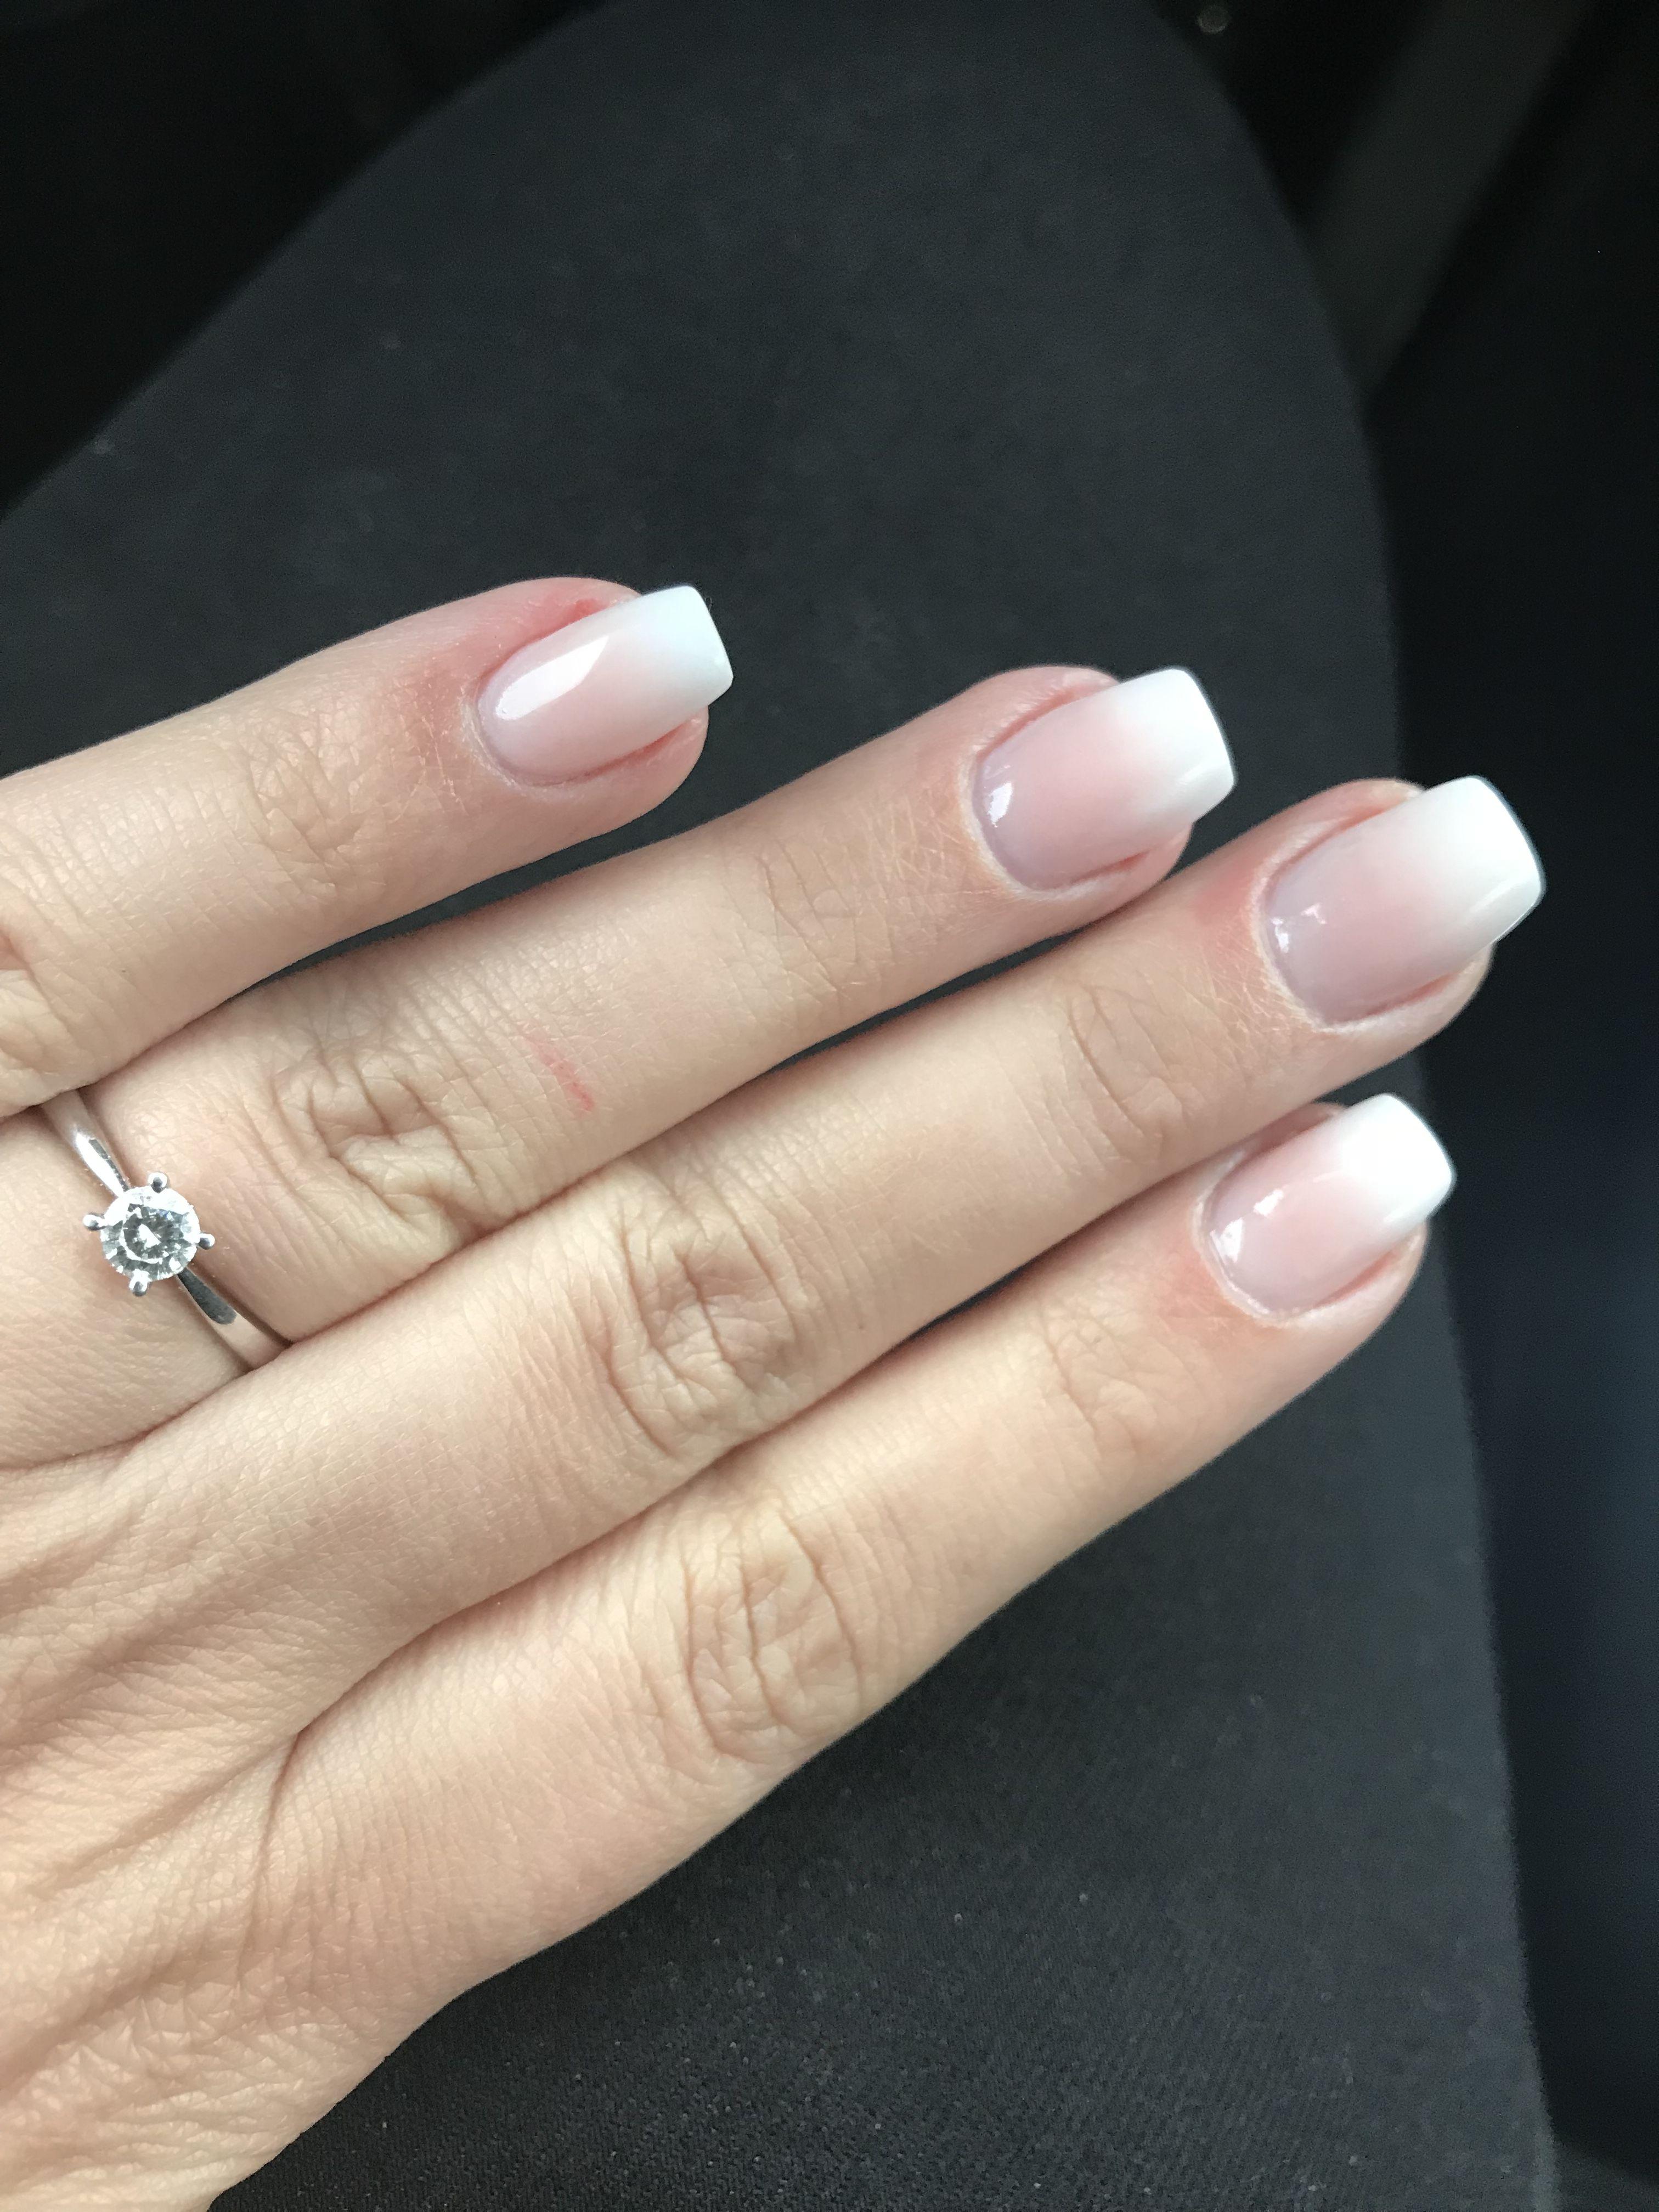 Babyboomer cuffin nails acryl nails engagement ring diamond | Nägel ...